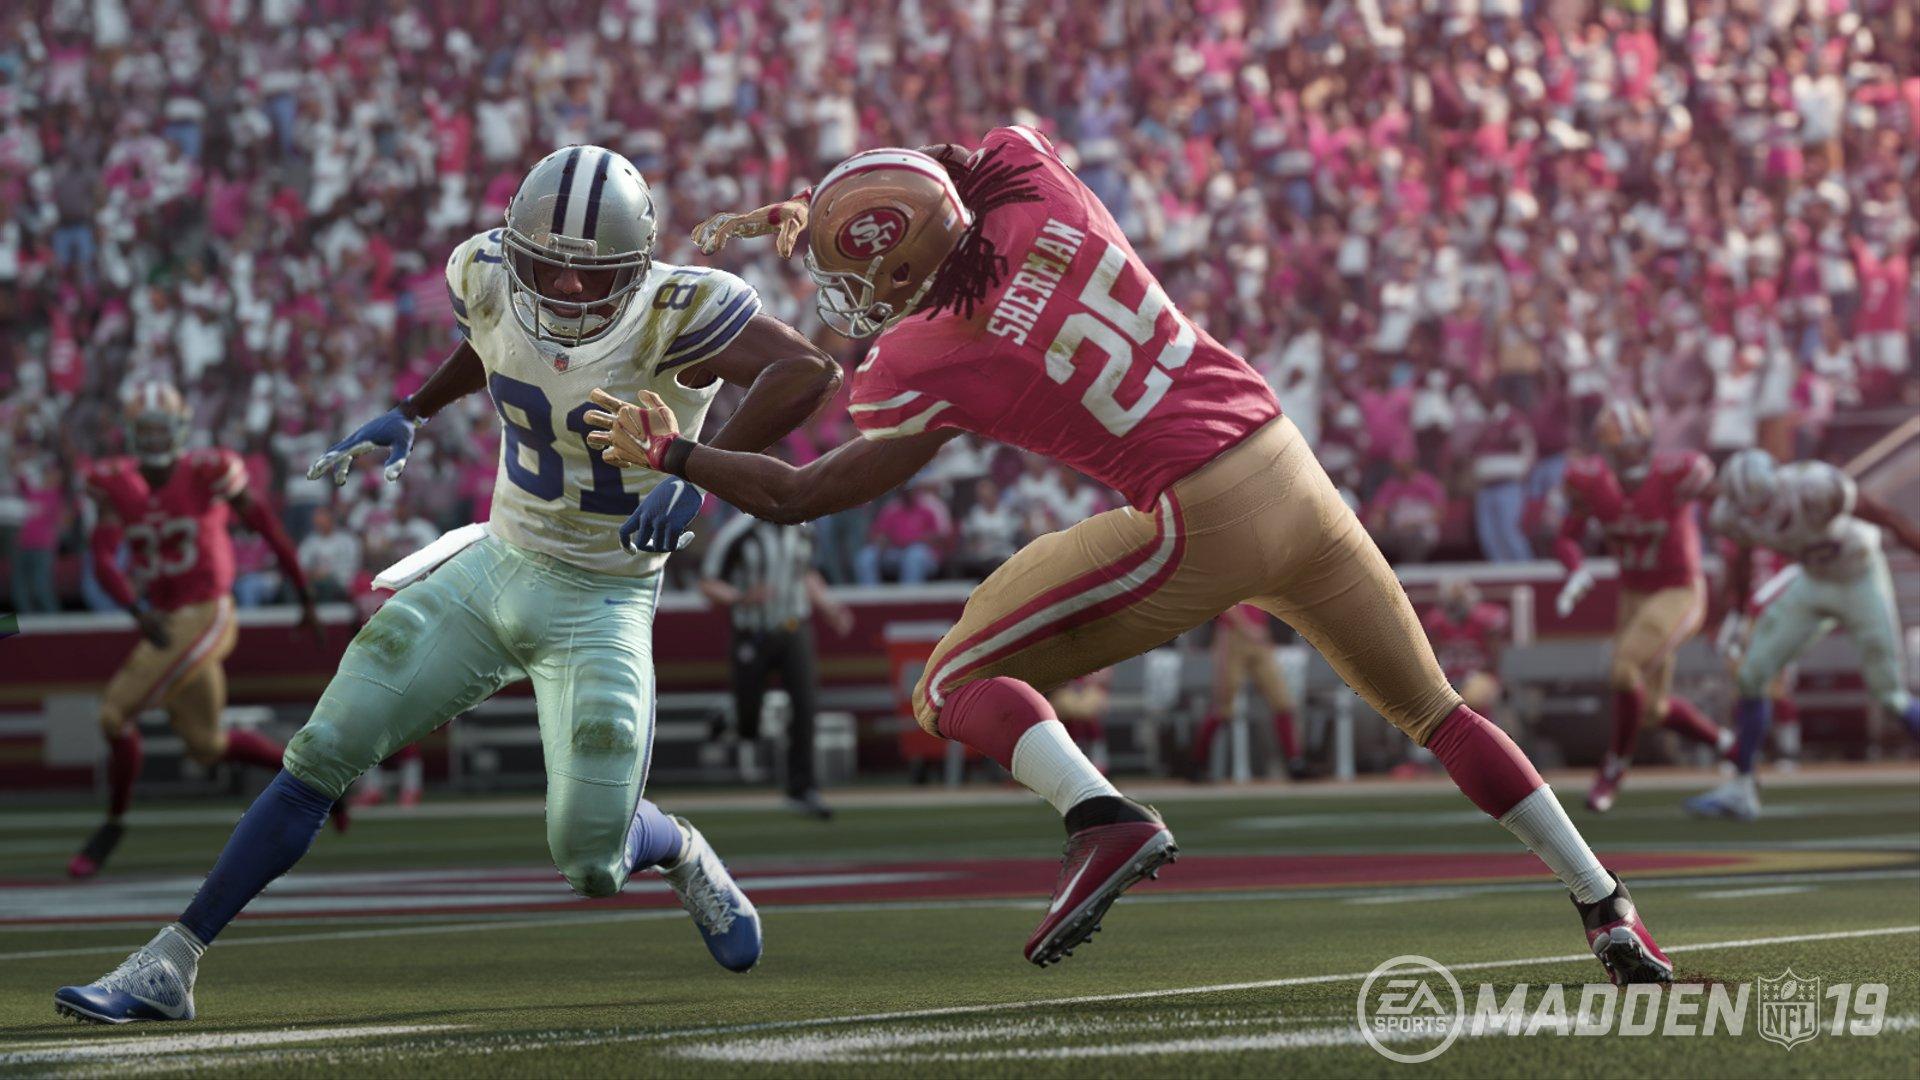 Madden 19 NFL Xbox